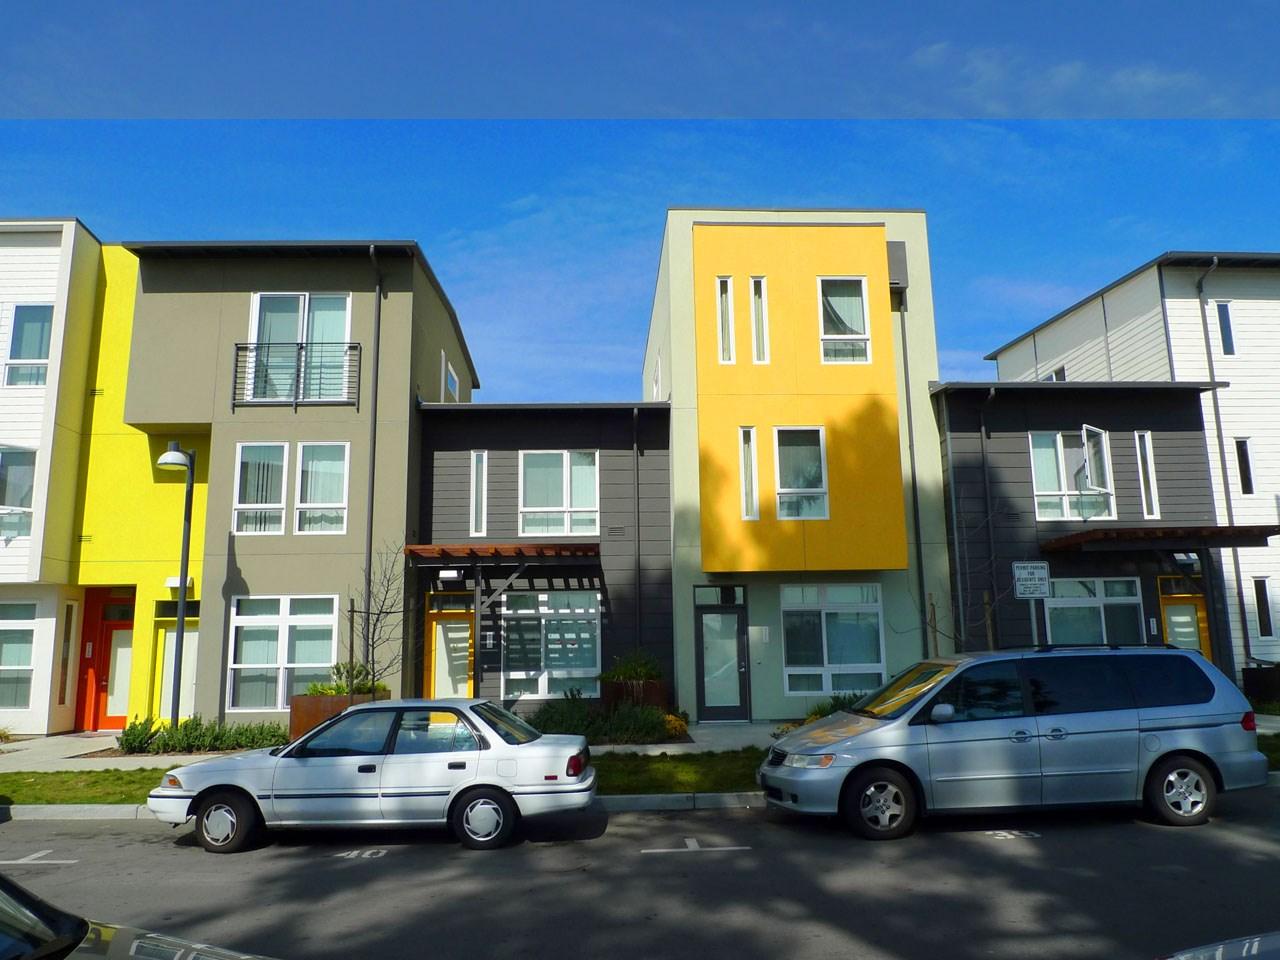 housing_1530908232619.jpg